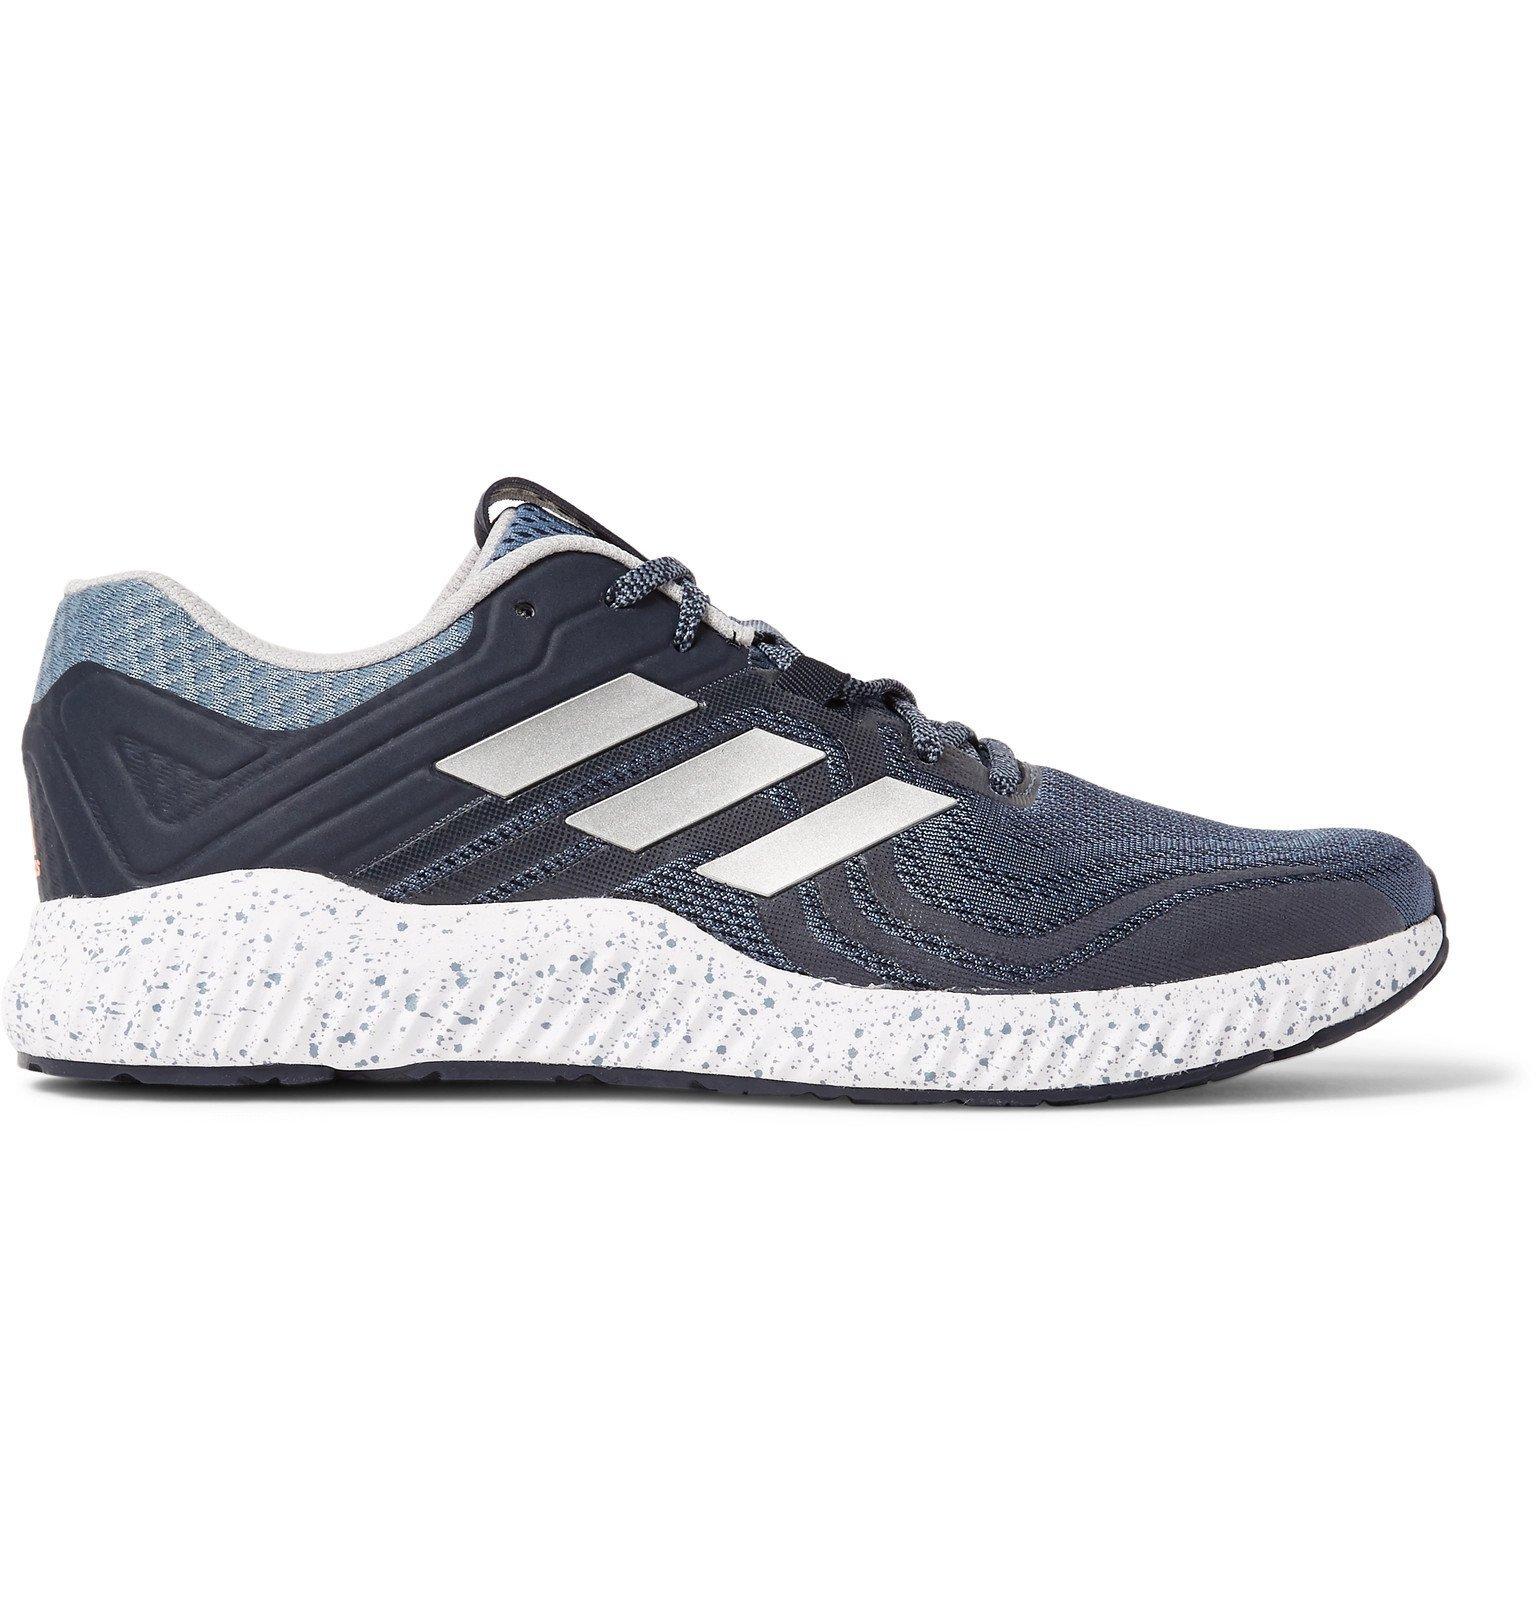 Adidas Sport - Aerobounce ST Rubber-Trimmed Mesh Running Sneakers - Gray